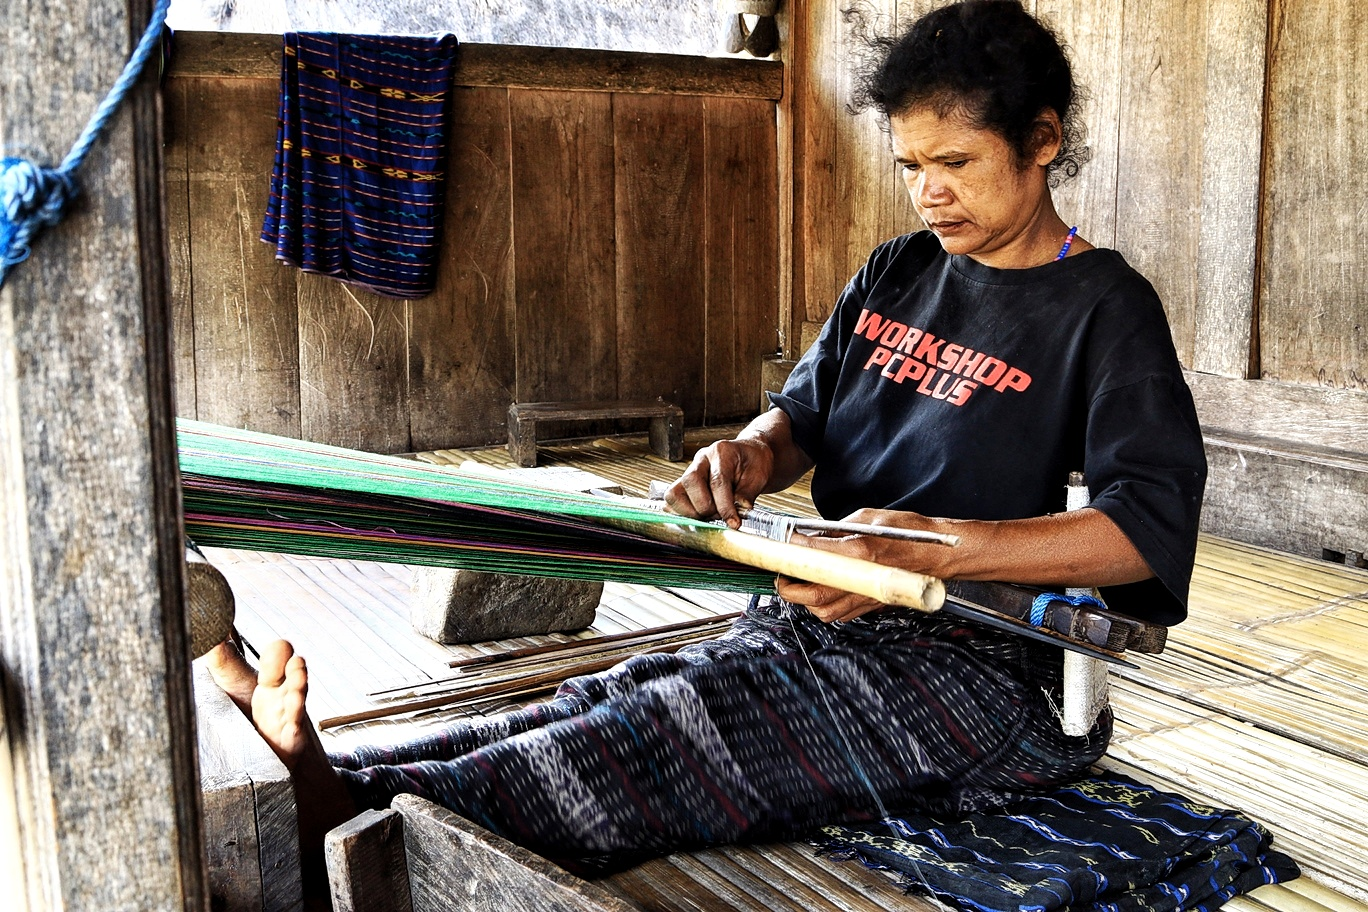 Proses Penenunan Kain Ikat Timor Khas Bena